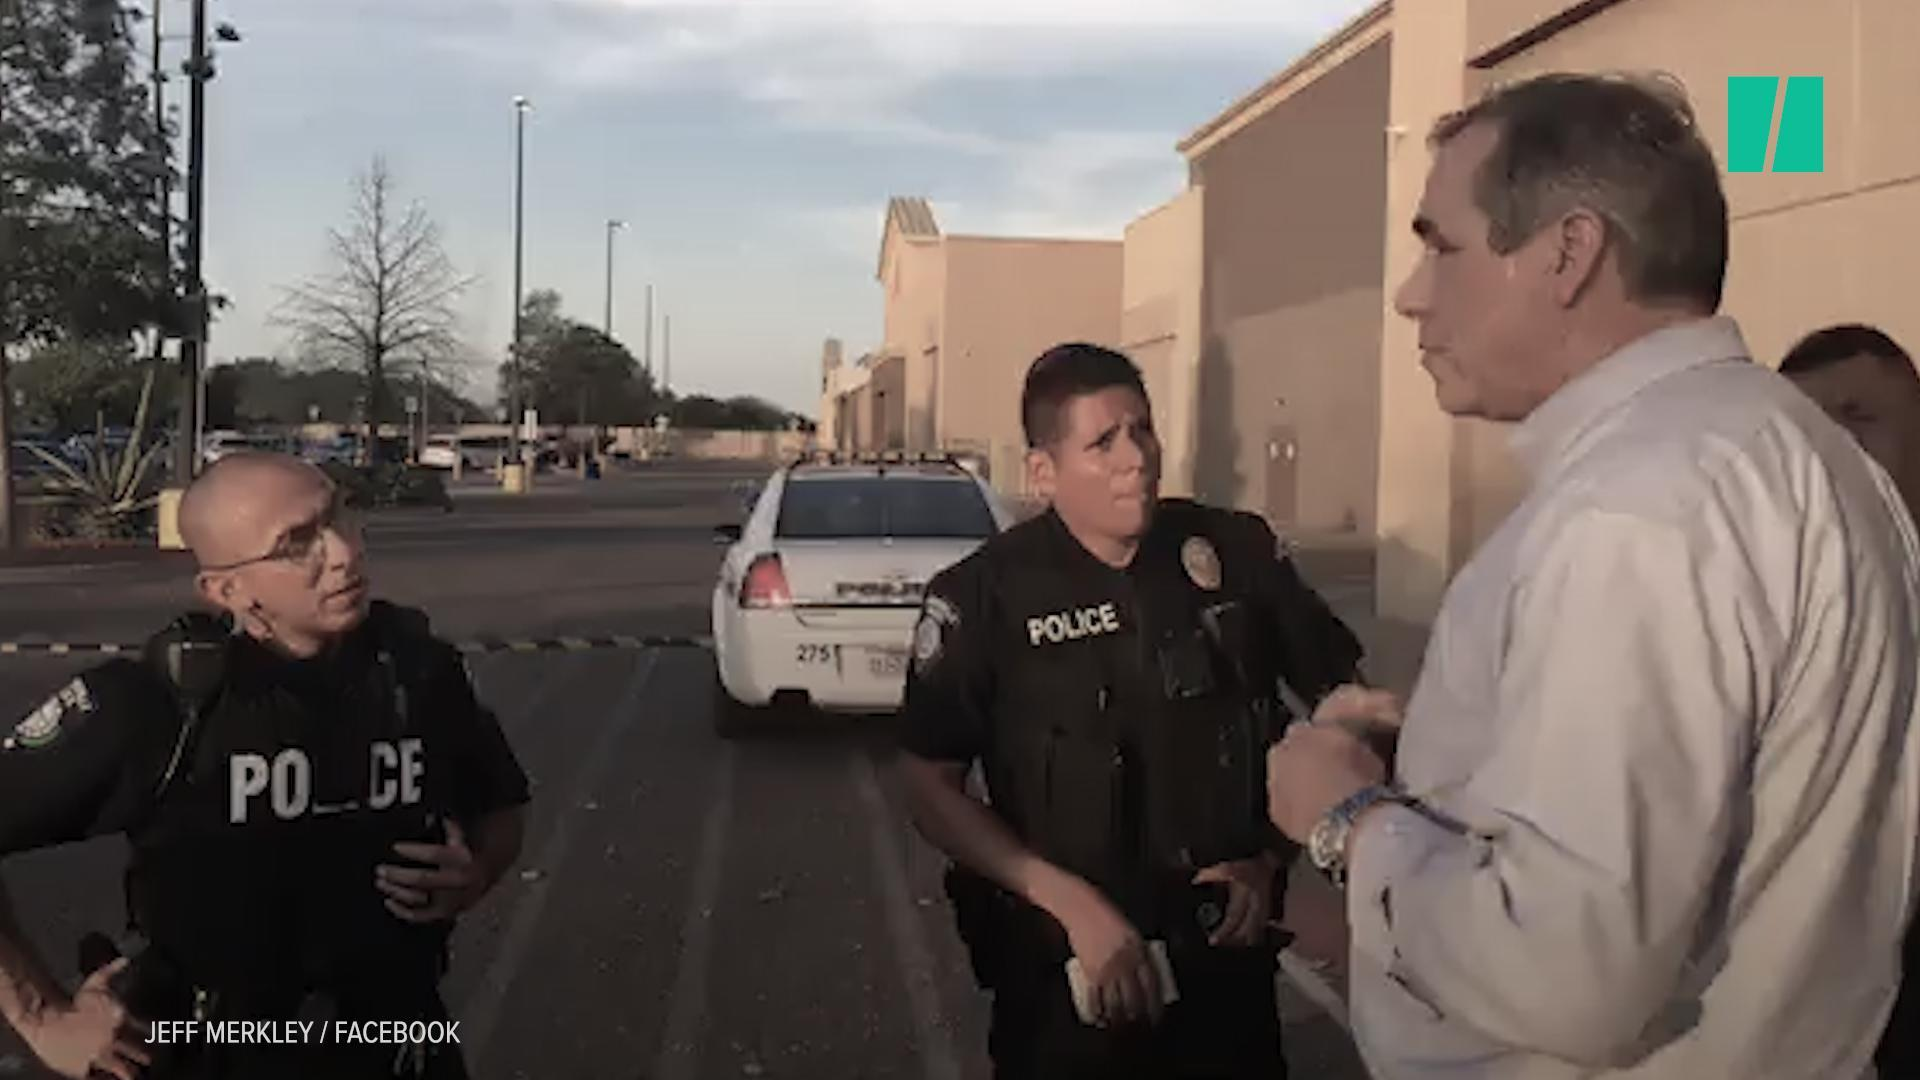 Oregon Senator Denied Entry To Immigration Detention Center, Has Police Called On Him